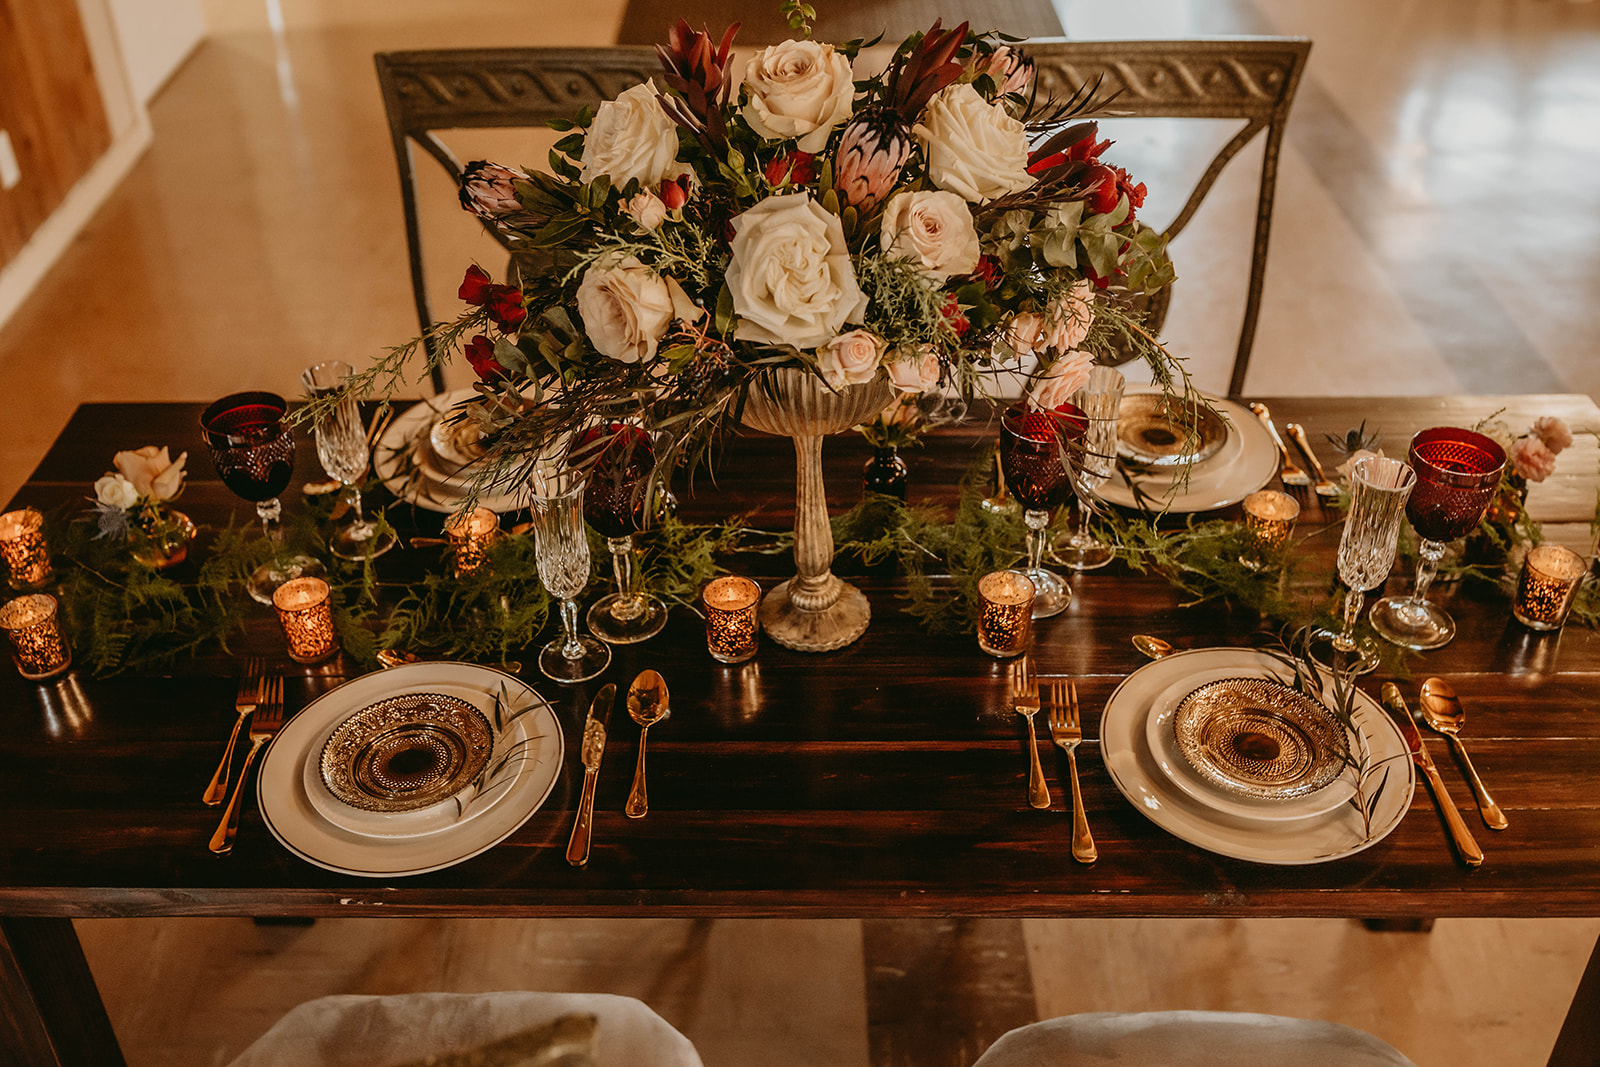 romantic wedding flowers, tablescape, wedding table, sweetheart table, portland wedding florist, oregon wedding florist, vintage wedding, chapel wedding